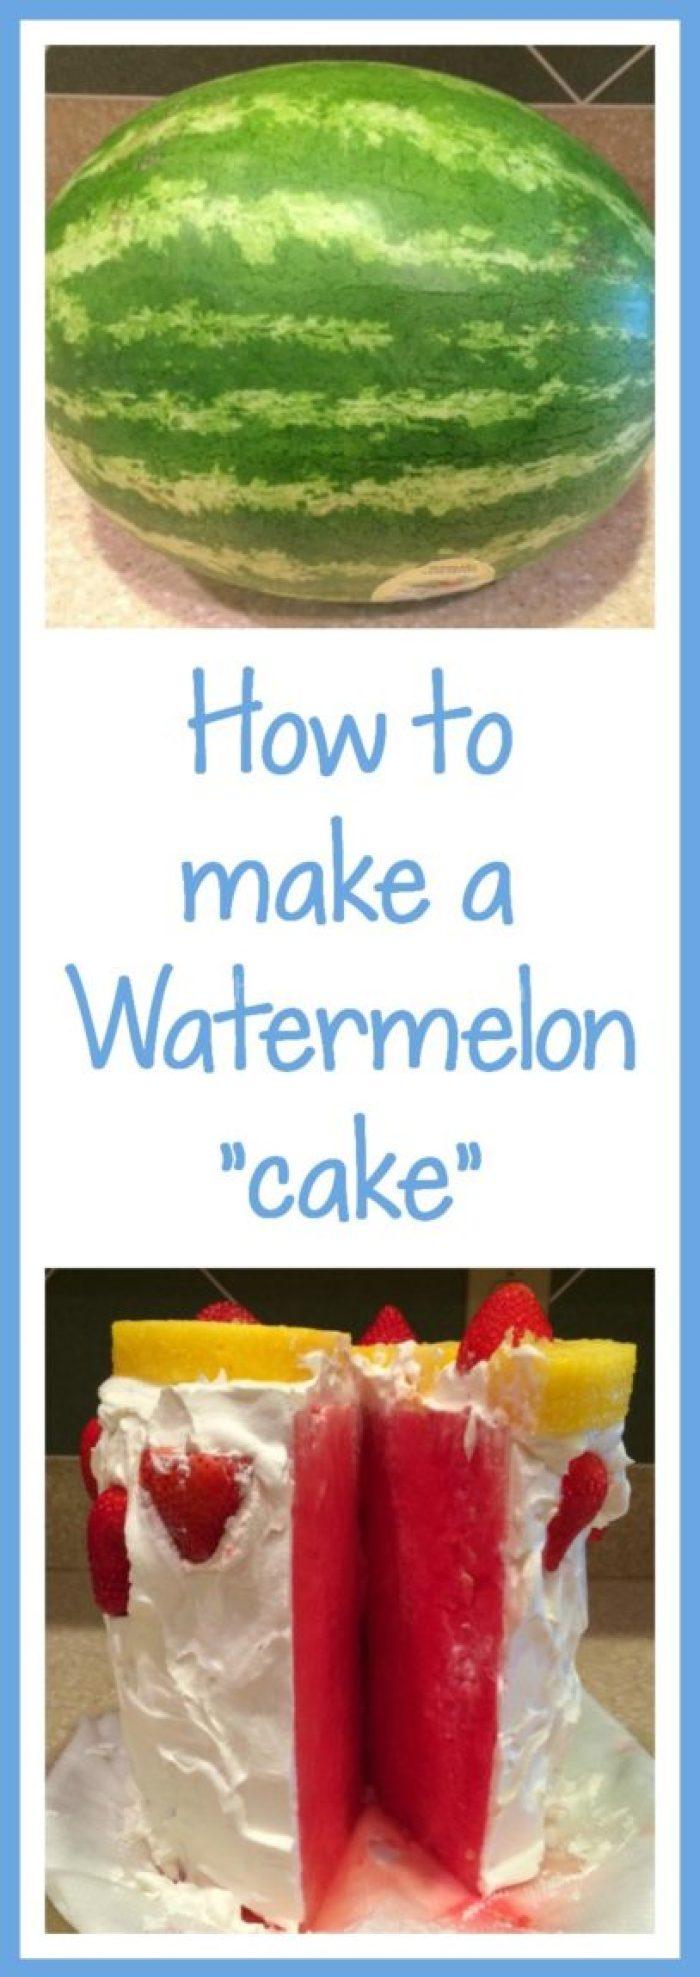 How to Make a watermelon Cake-TheMomMaven.com